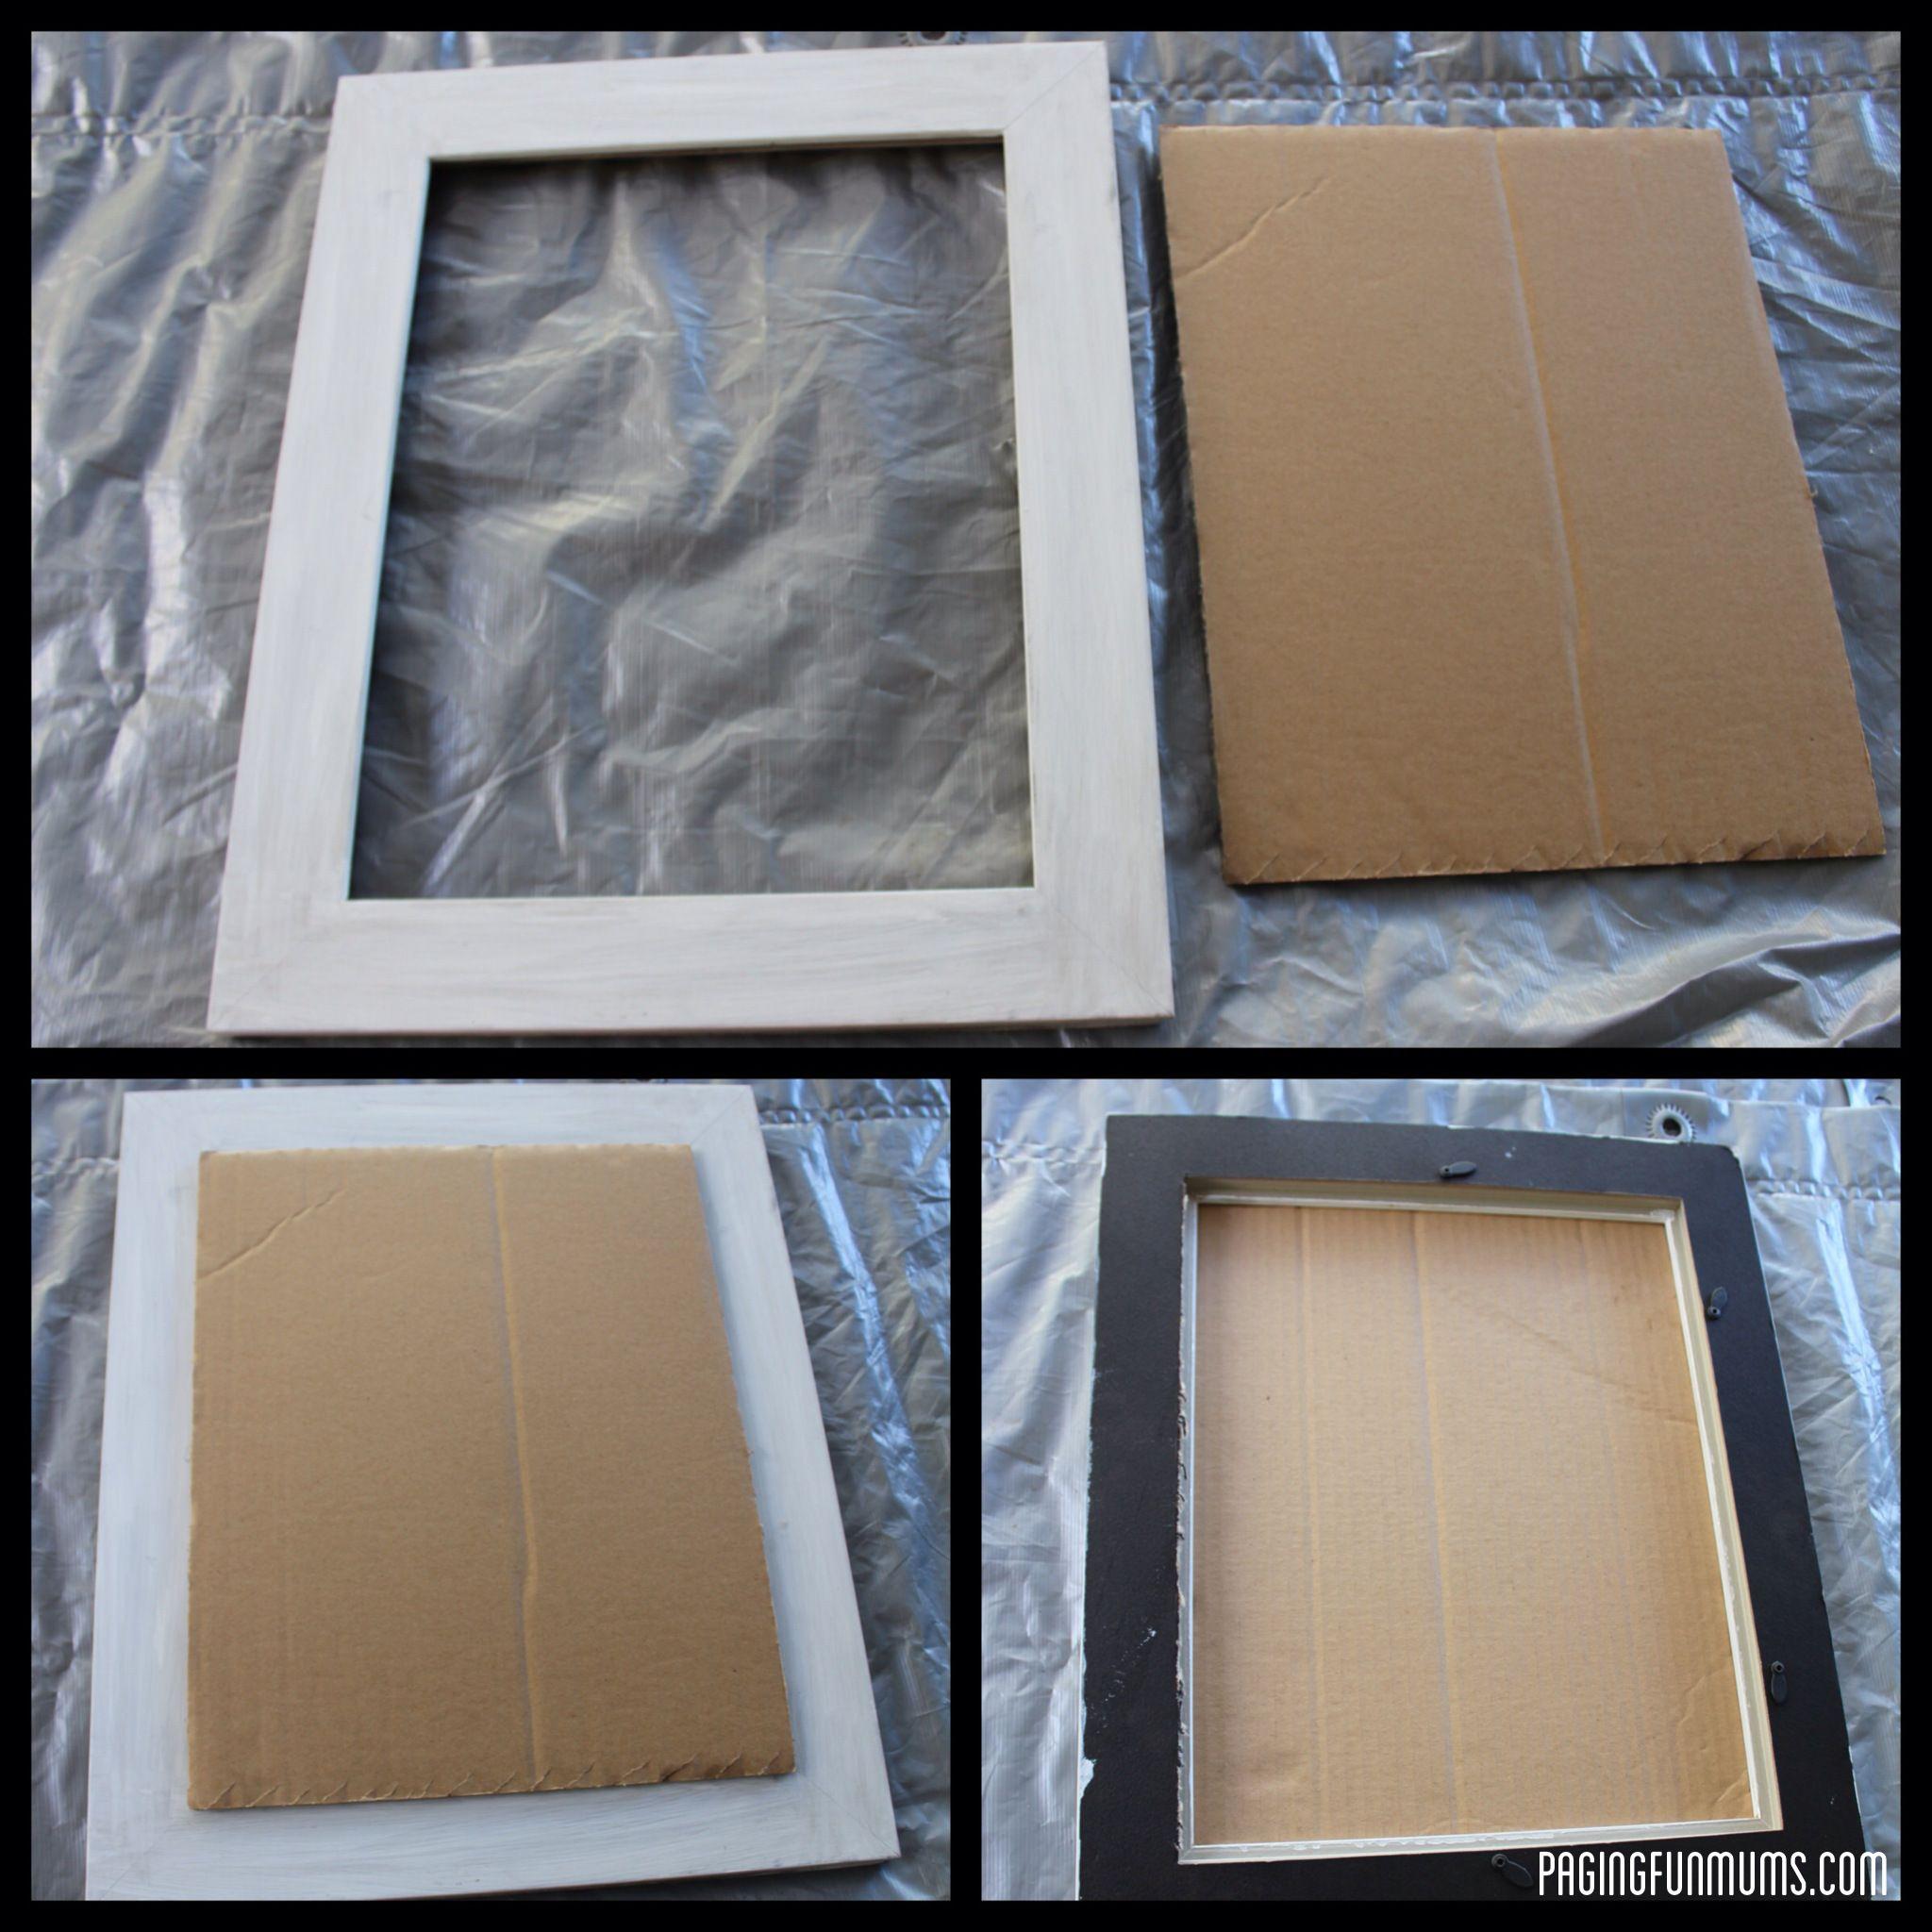 sand footprint craft full diy instructions crafty pinterest empreinte bricolage facile. Black Bedroom Furniture Sets. Home Design Ideas